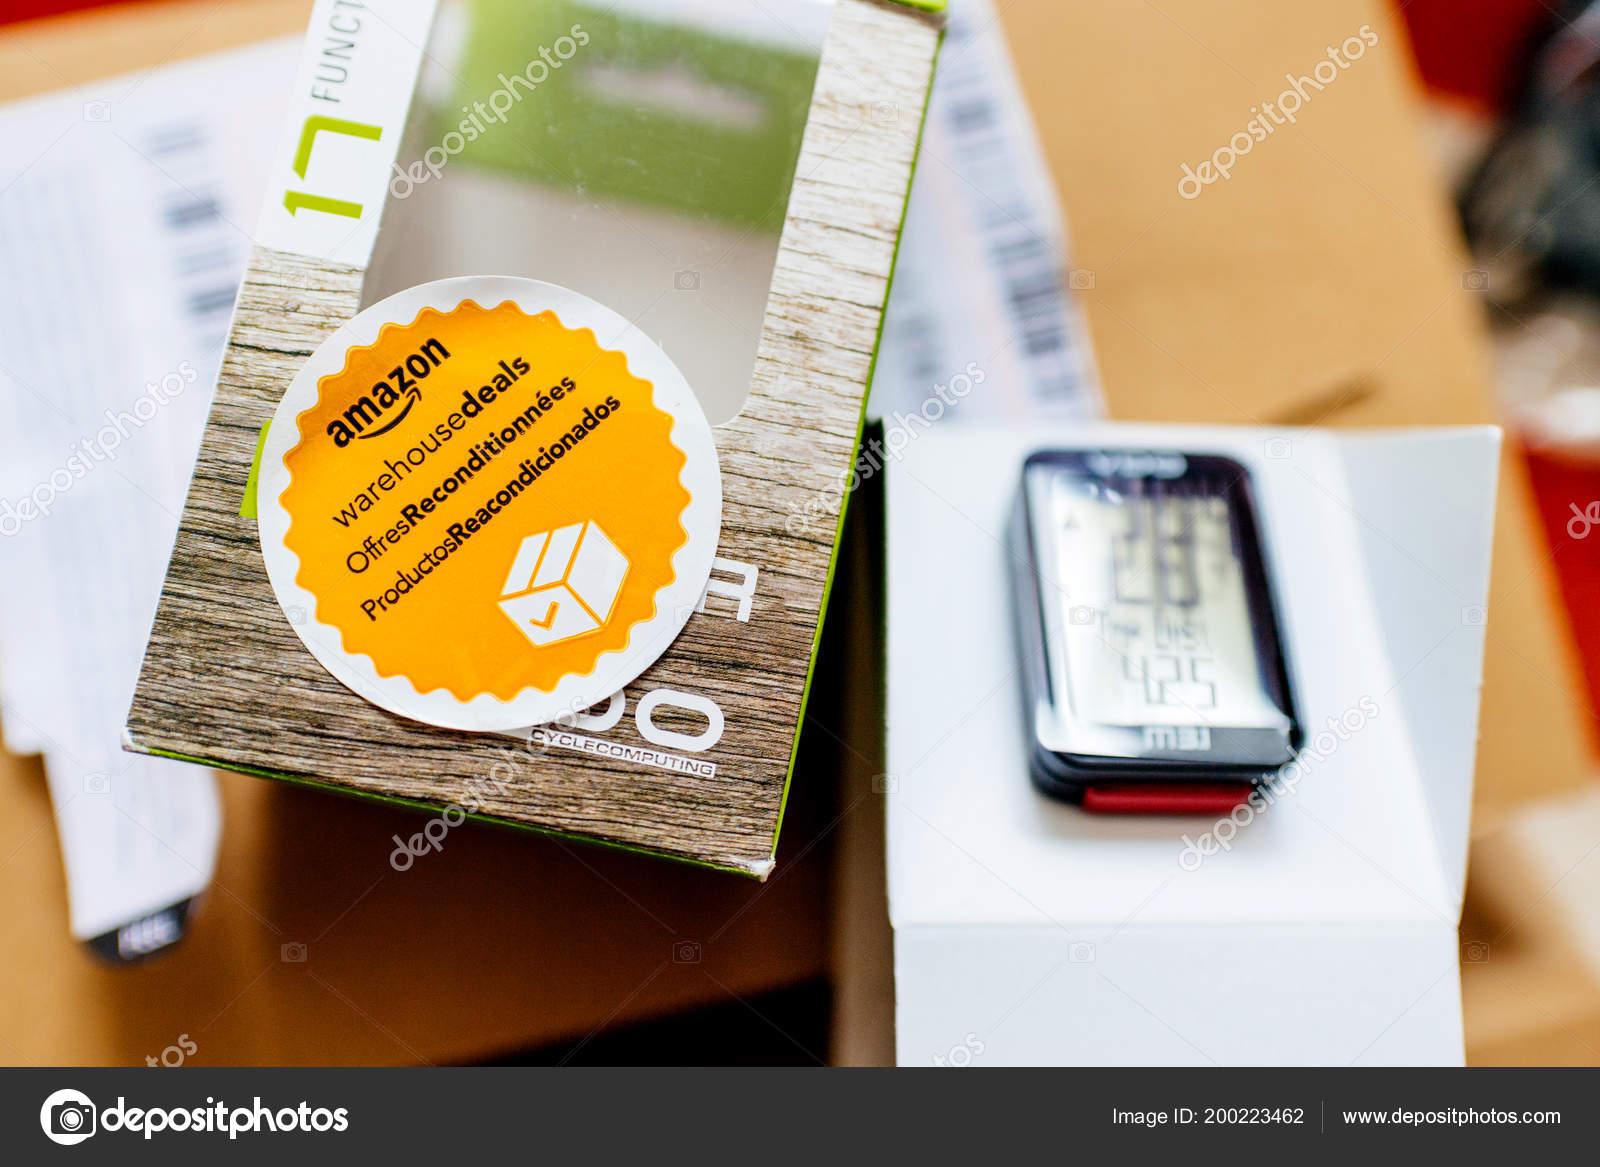 Entrepôt damazon traite autocollant photo